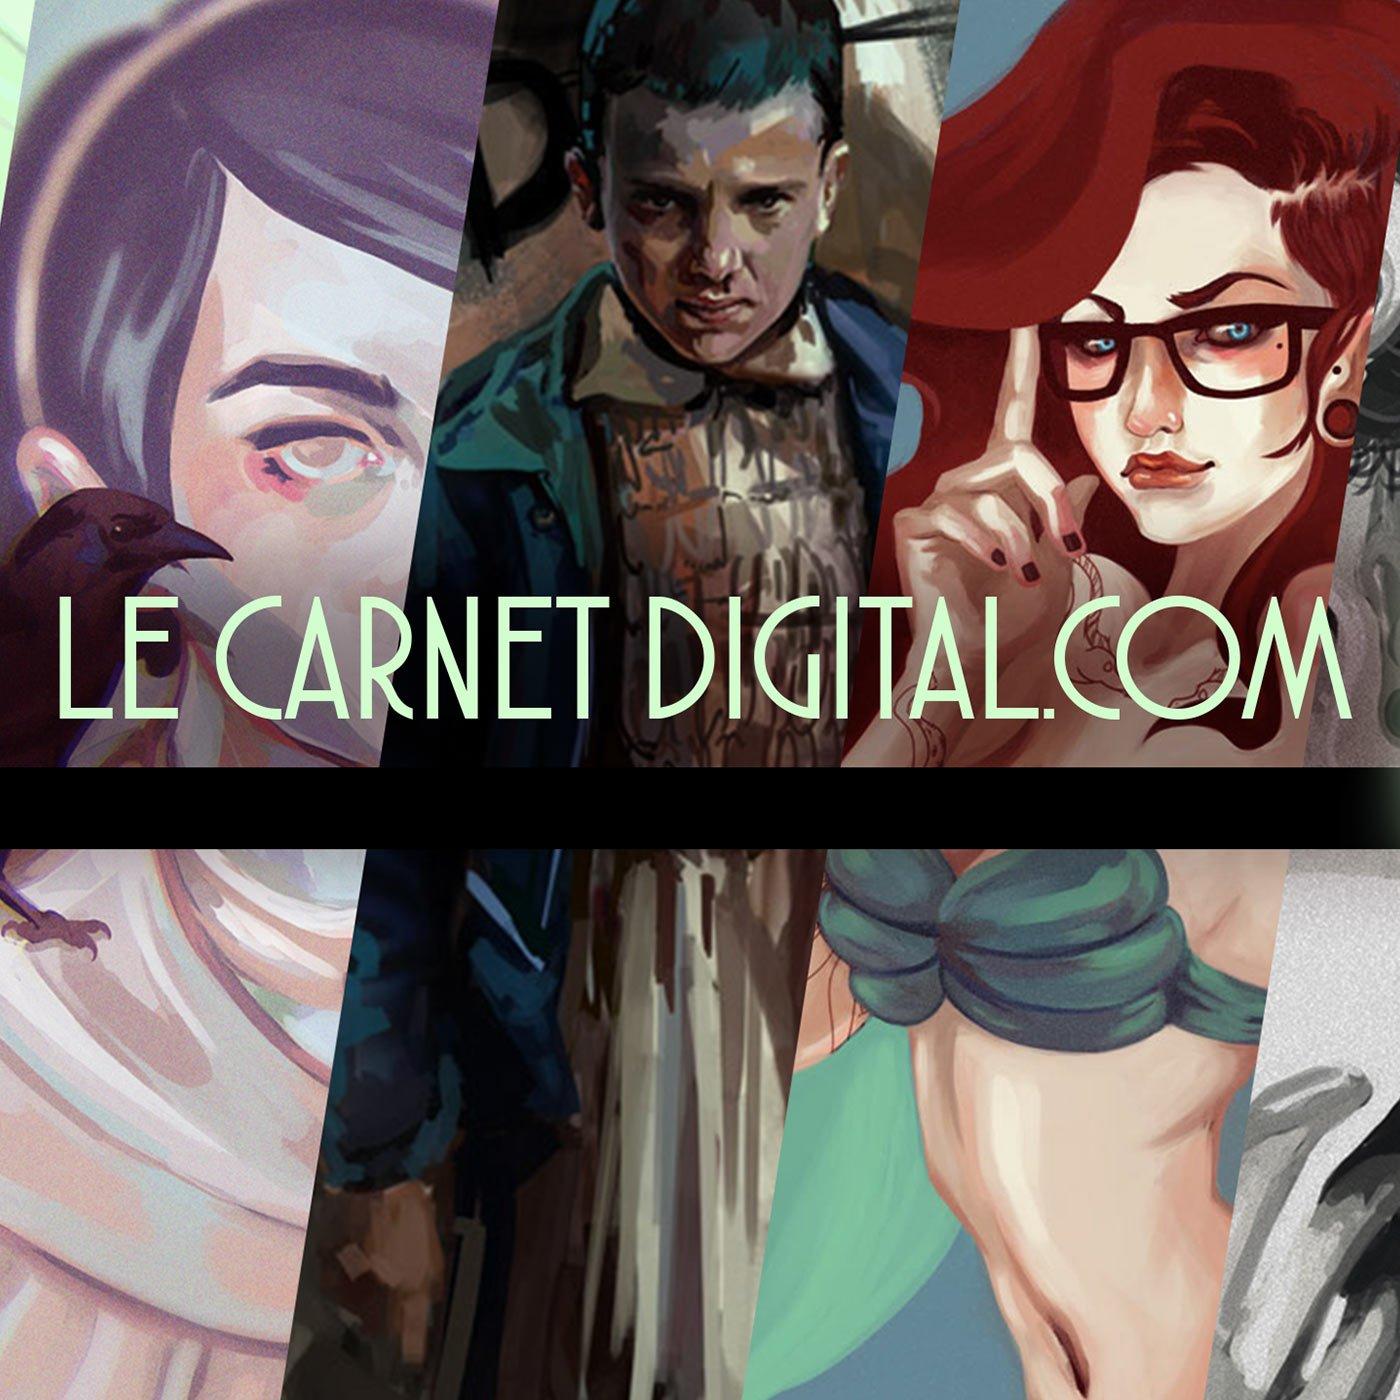 Le Carnet Digital